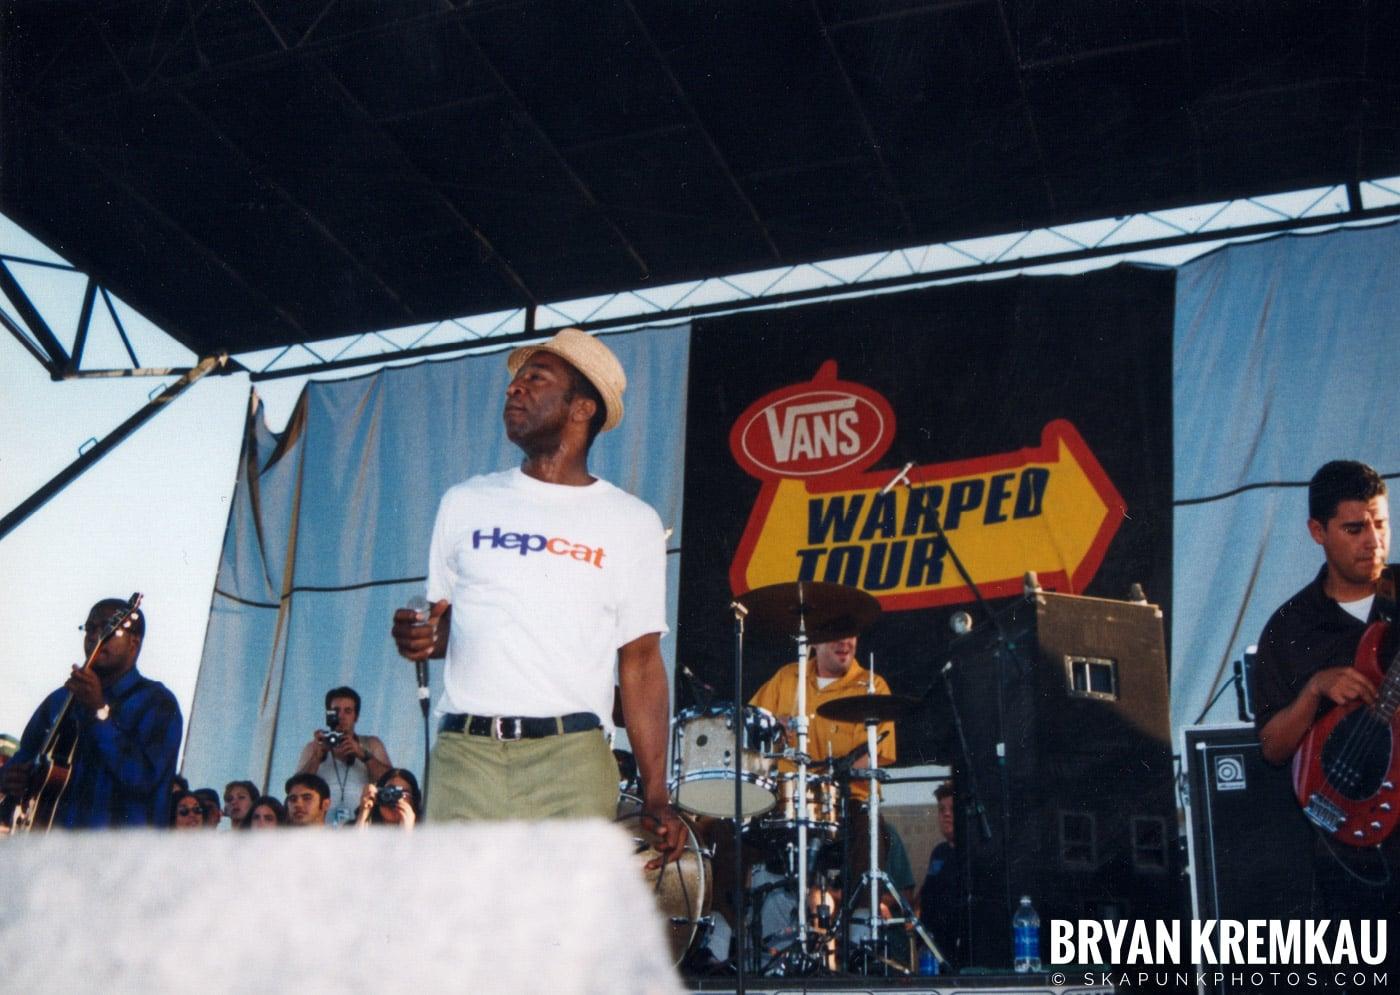 Hepcat @ Vans Warped Tour, Randall's Island, NYC - 8.1.98 (13)